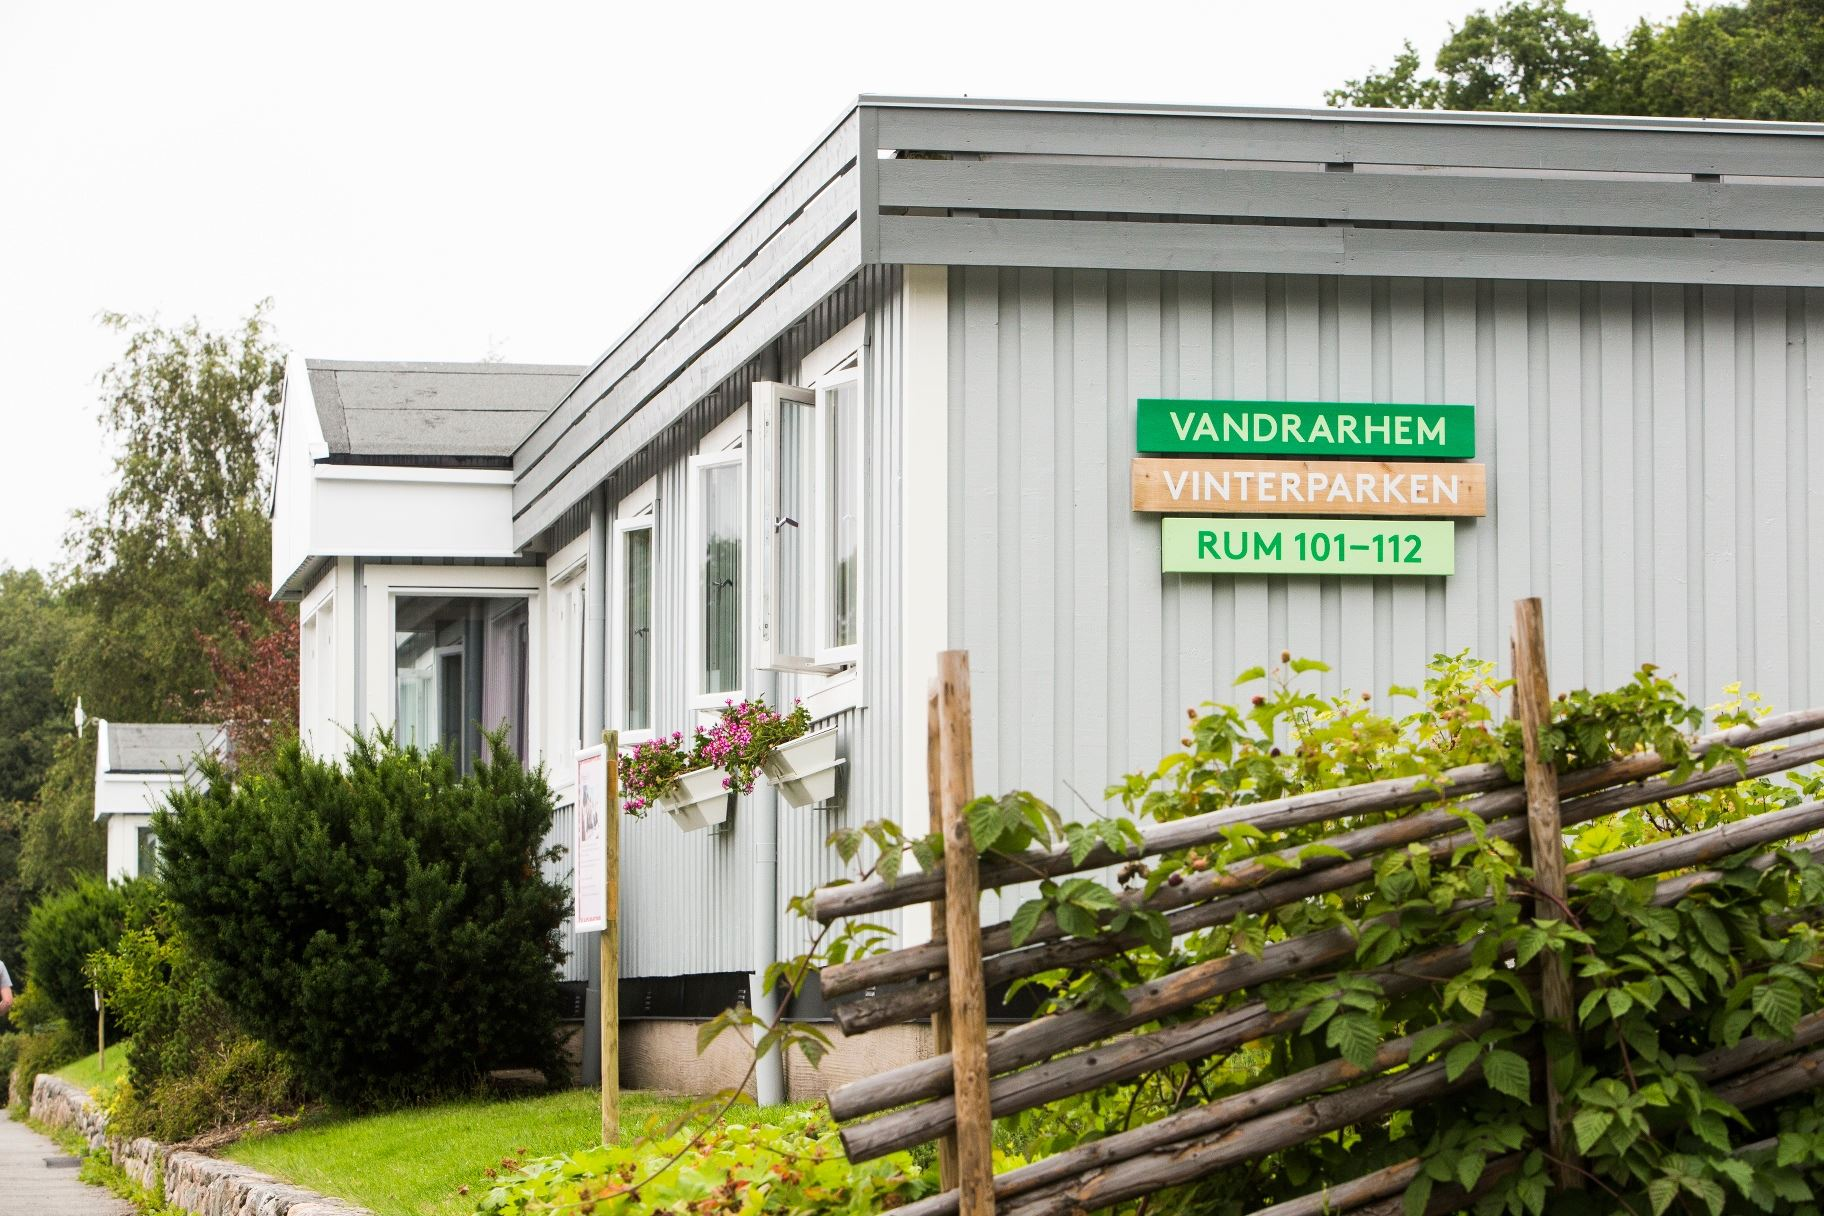 Lisebergsbyn/Vandrarhem